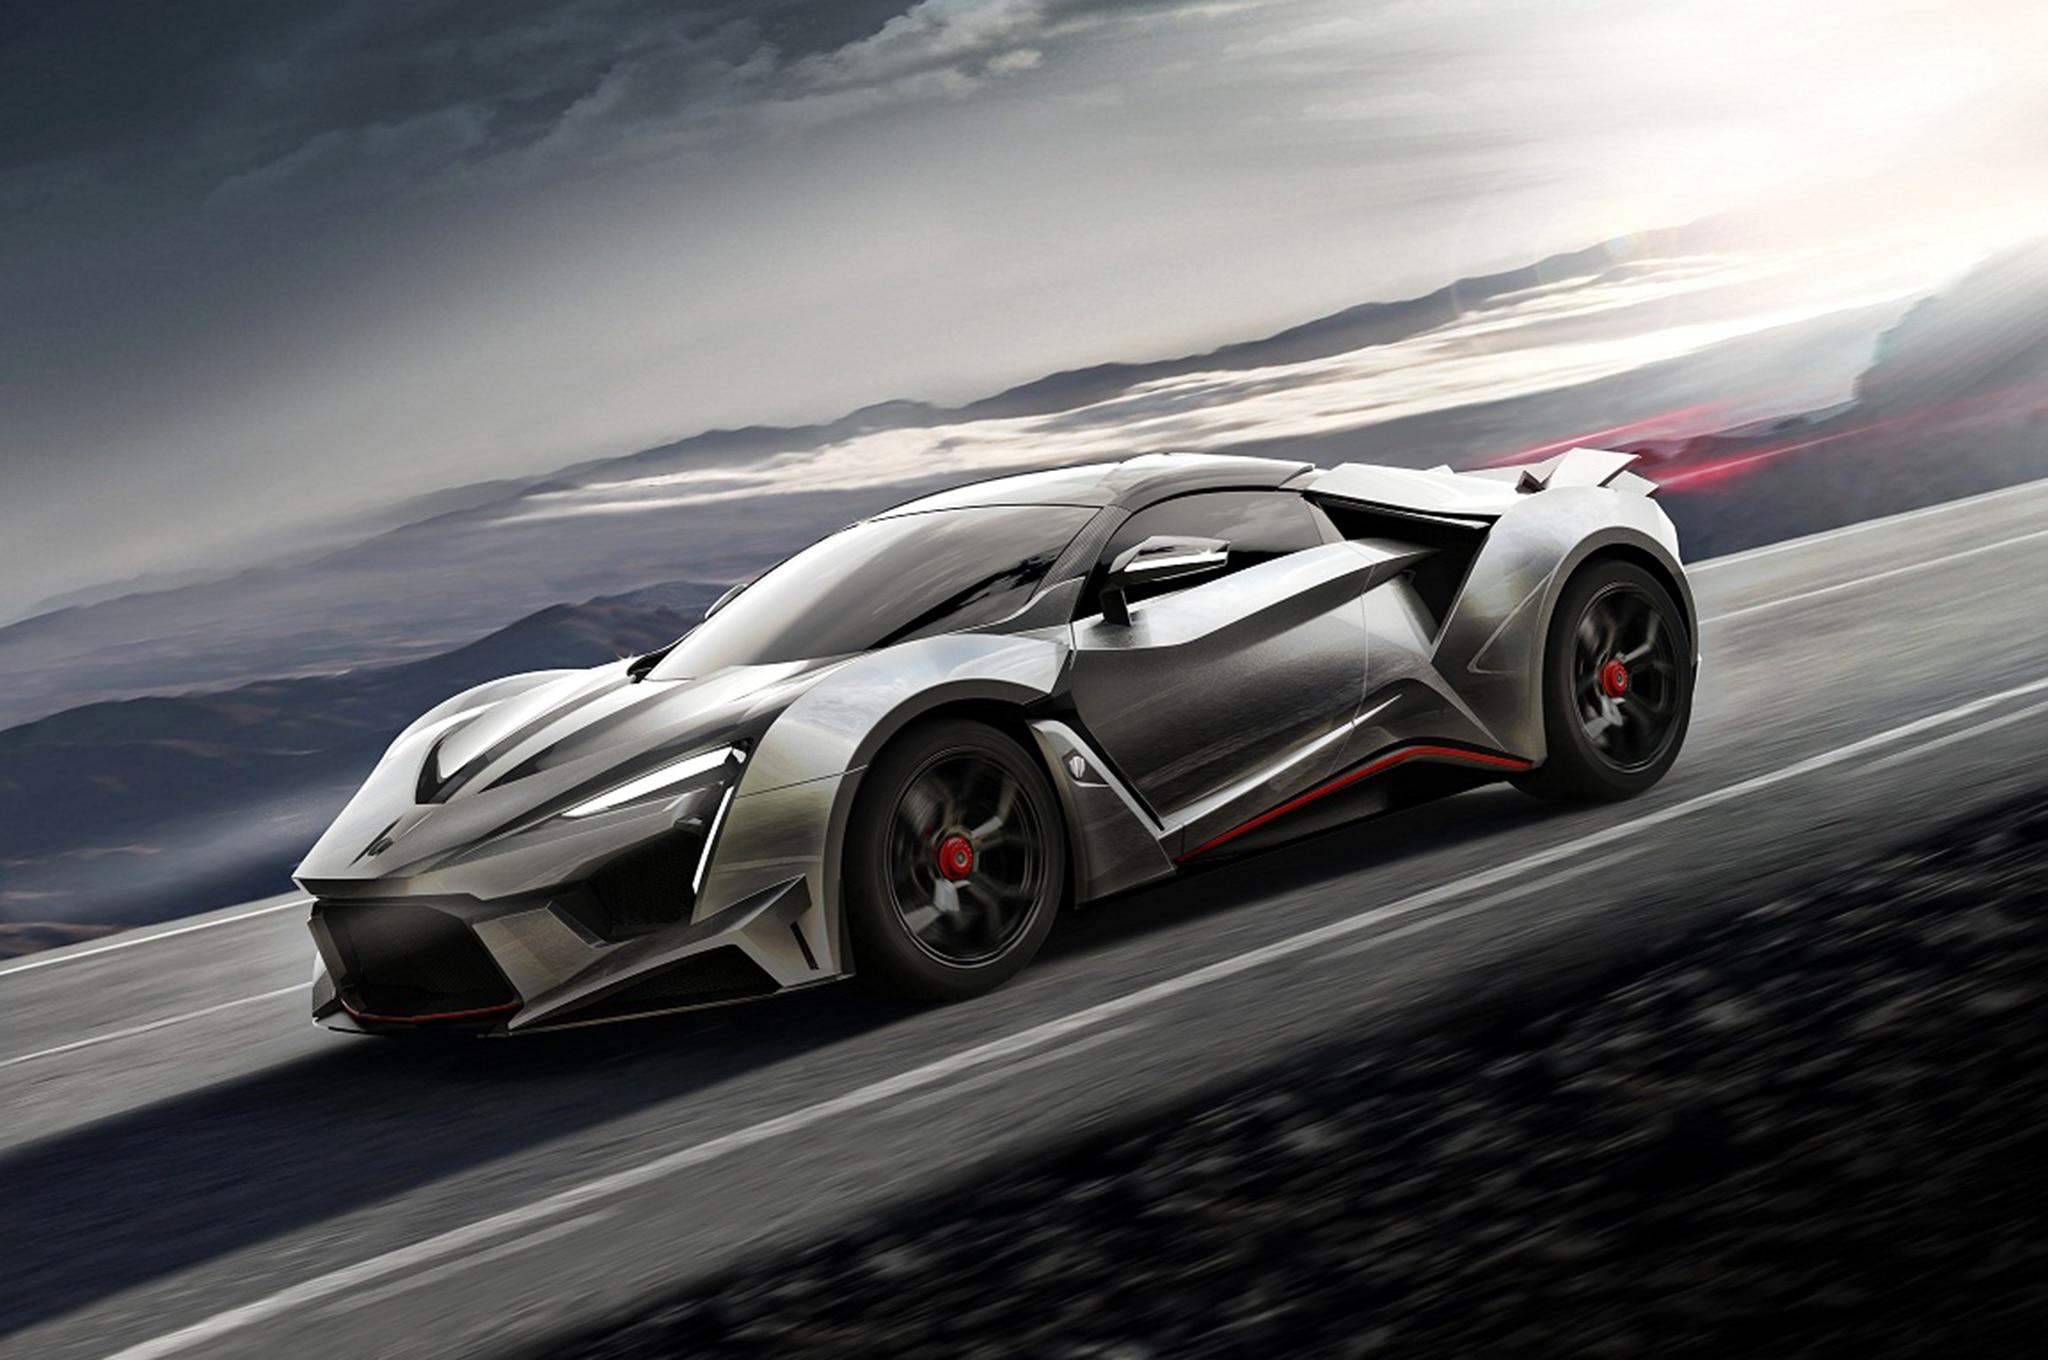 W Motors Fenyr >> W Motors Reveals 900-HP Fenyr SuperSport Hypercar